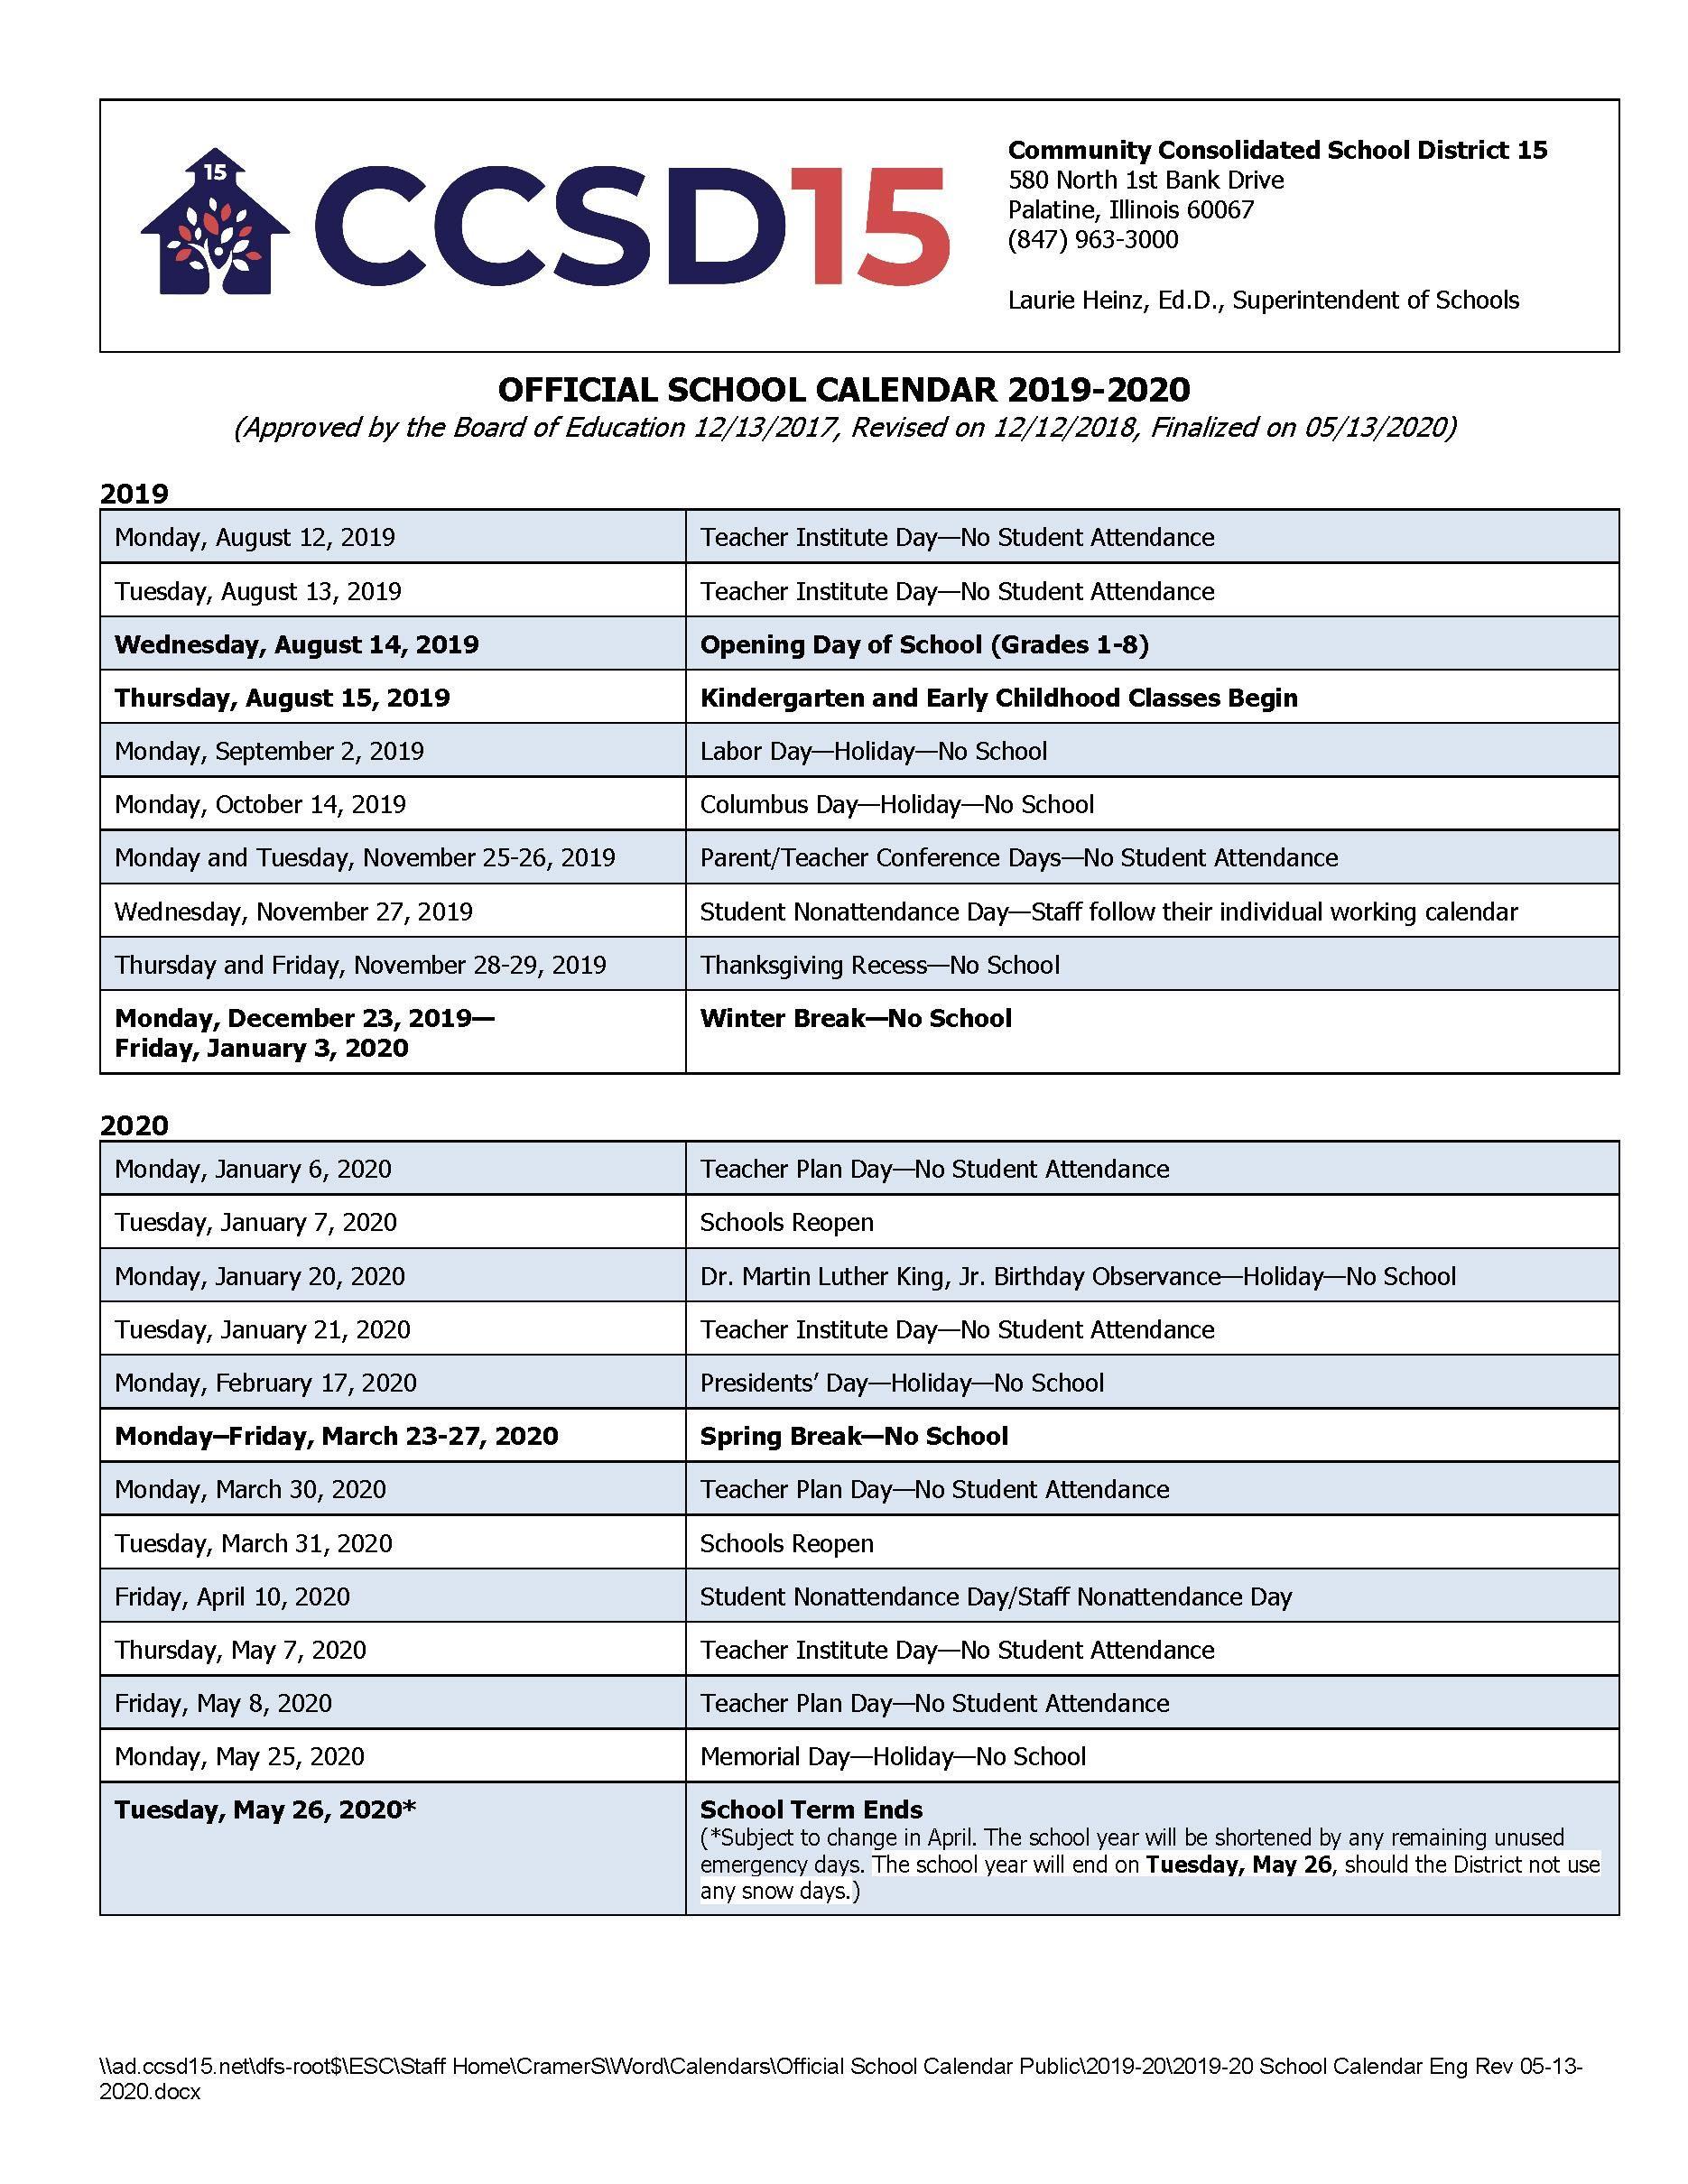 Calendars / 2019 20 Official School Calendar With Regard To East Meadow High School Calandar 2012